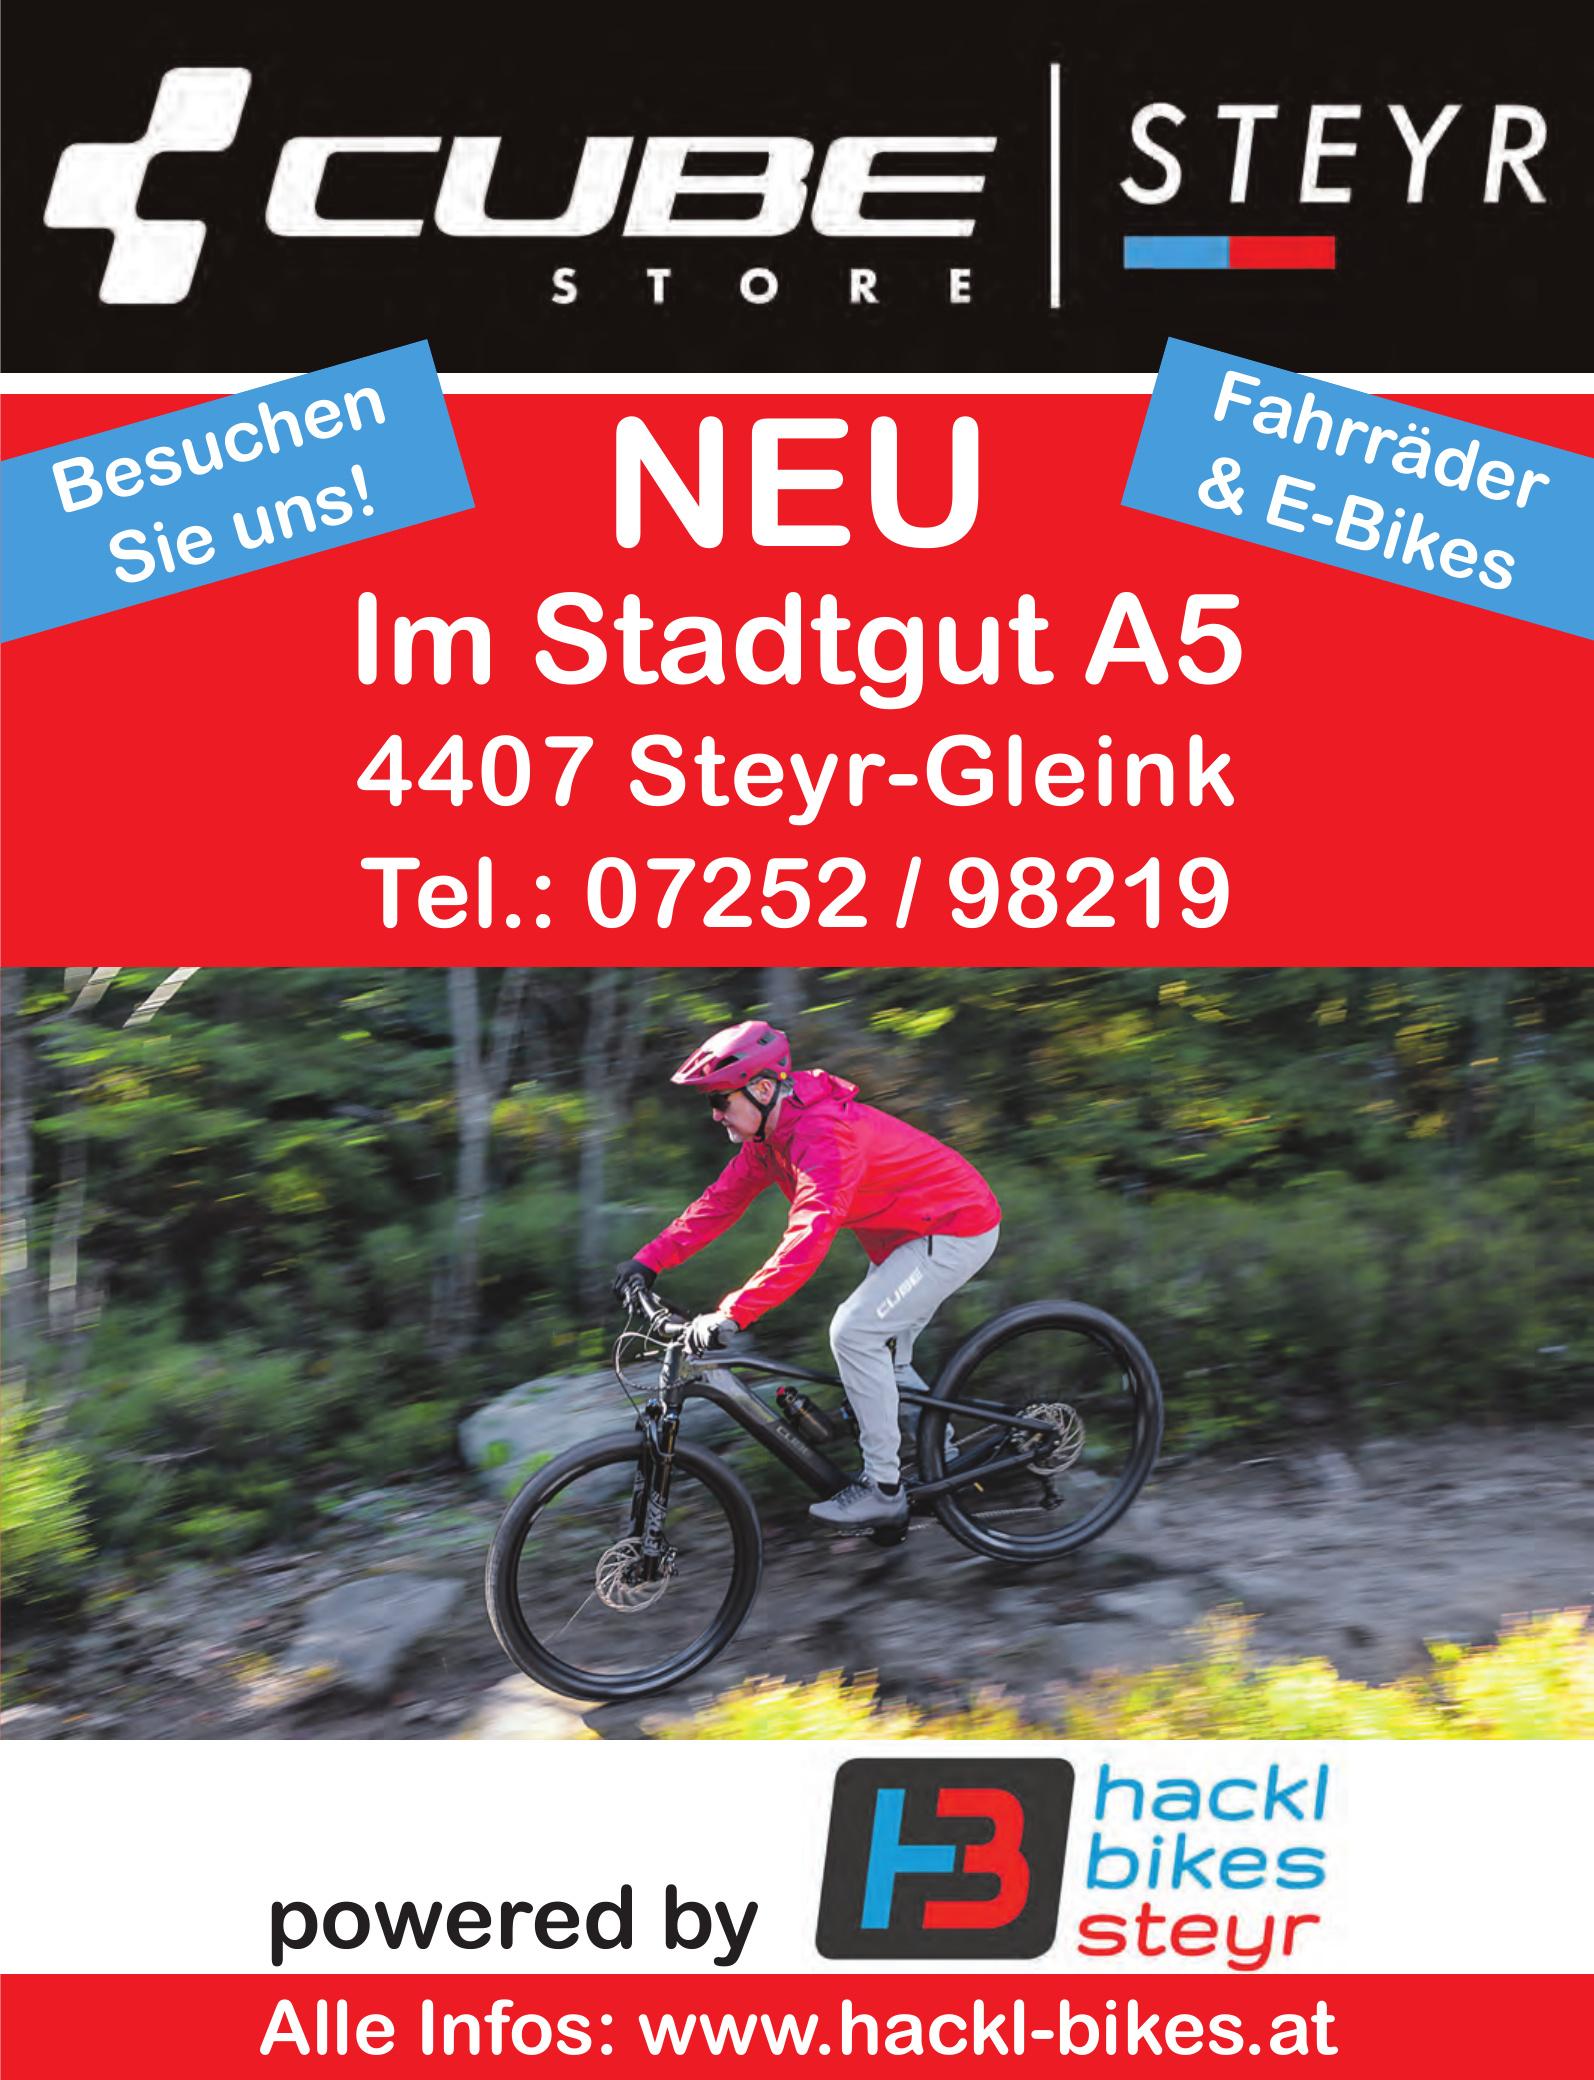 CUBE Store Steyr - Hackl Bikes Steyr